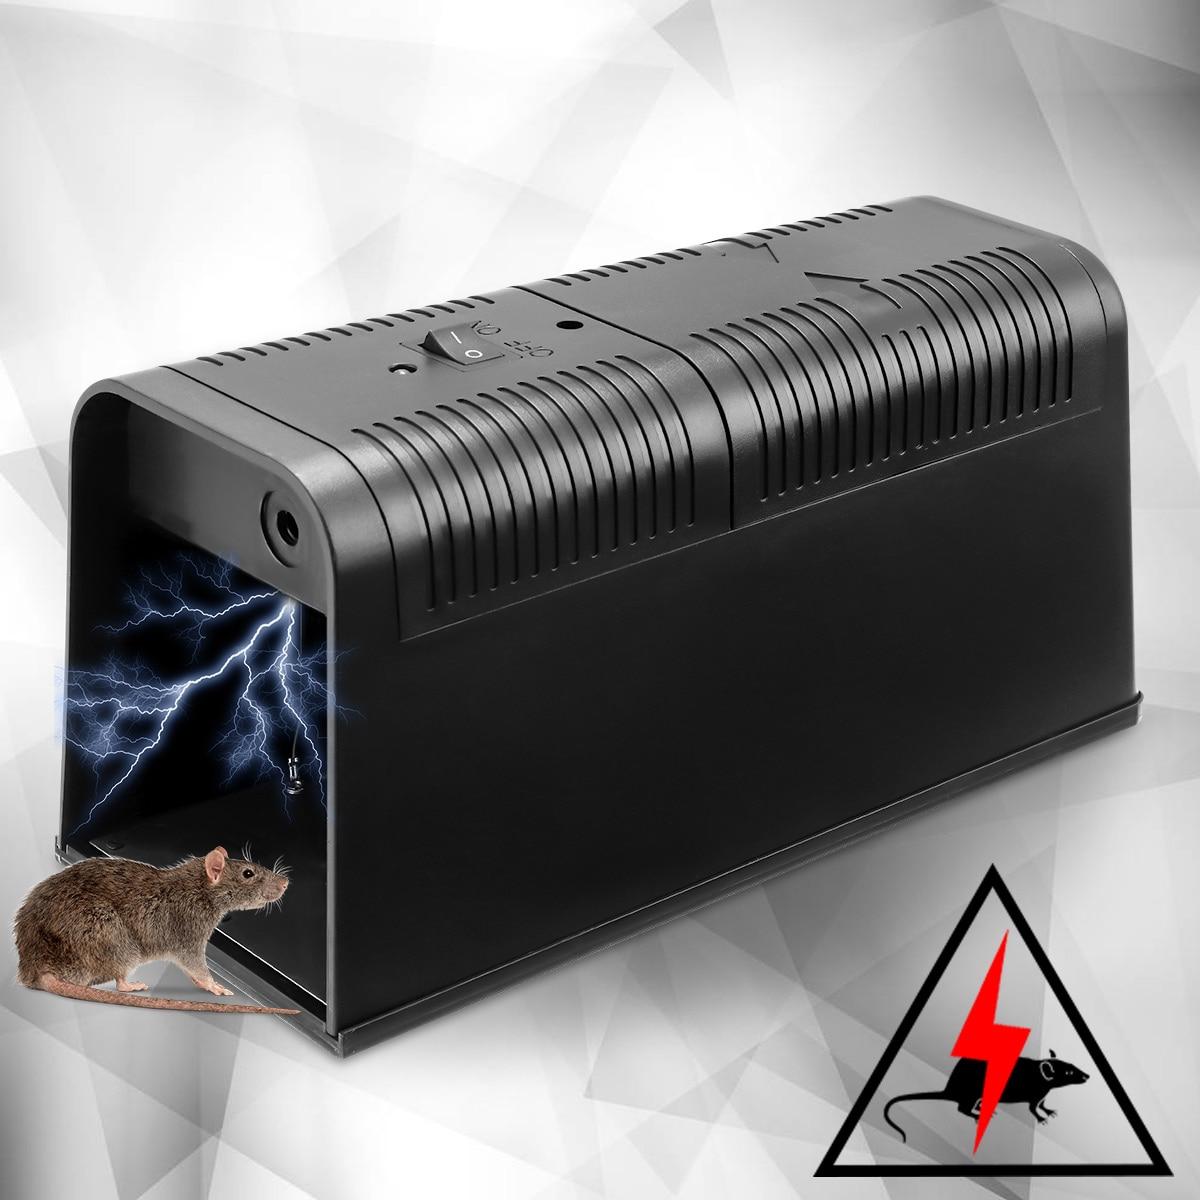 1 Pcs Elektrische Maus Ratte Mausefalle Maus Mörder Elektronische Nagetier Maus Zapper Falle Humane Nagetier Mausefalle Gerät 235X102X113 MM DC6V